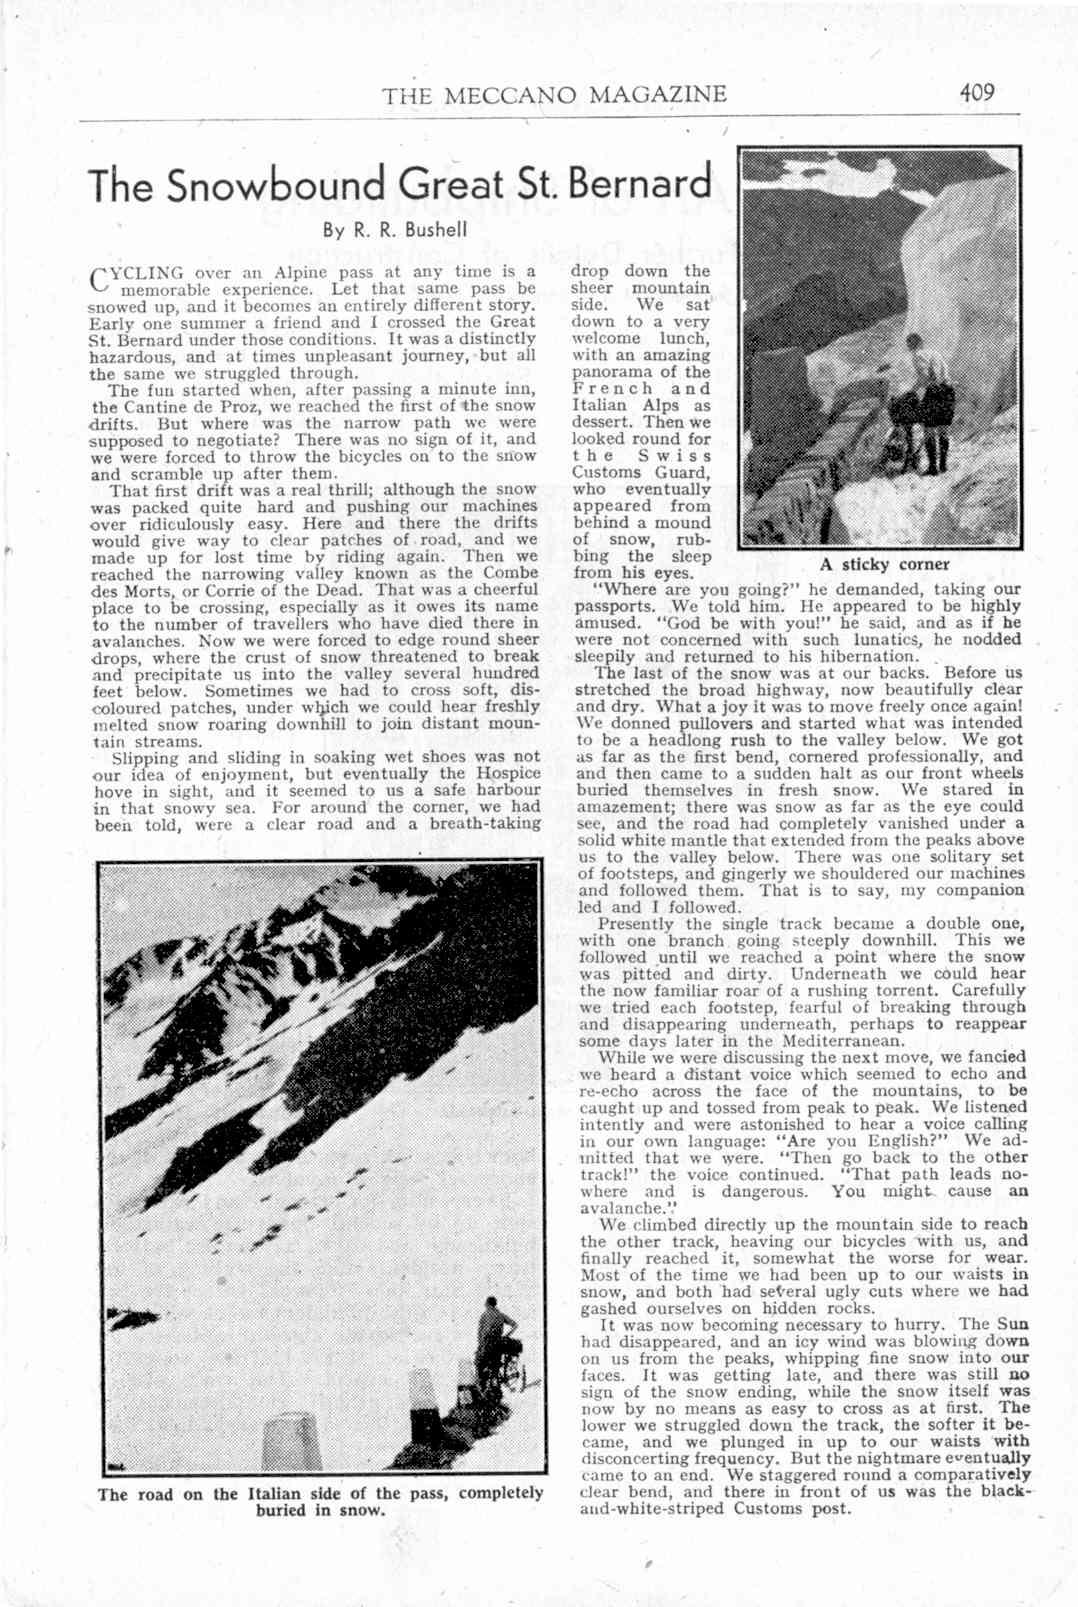 UK Meccano Magazine December 1944 Page 409